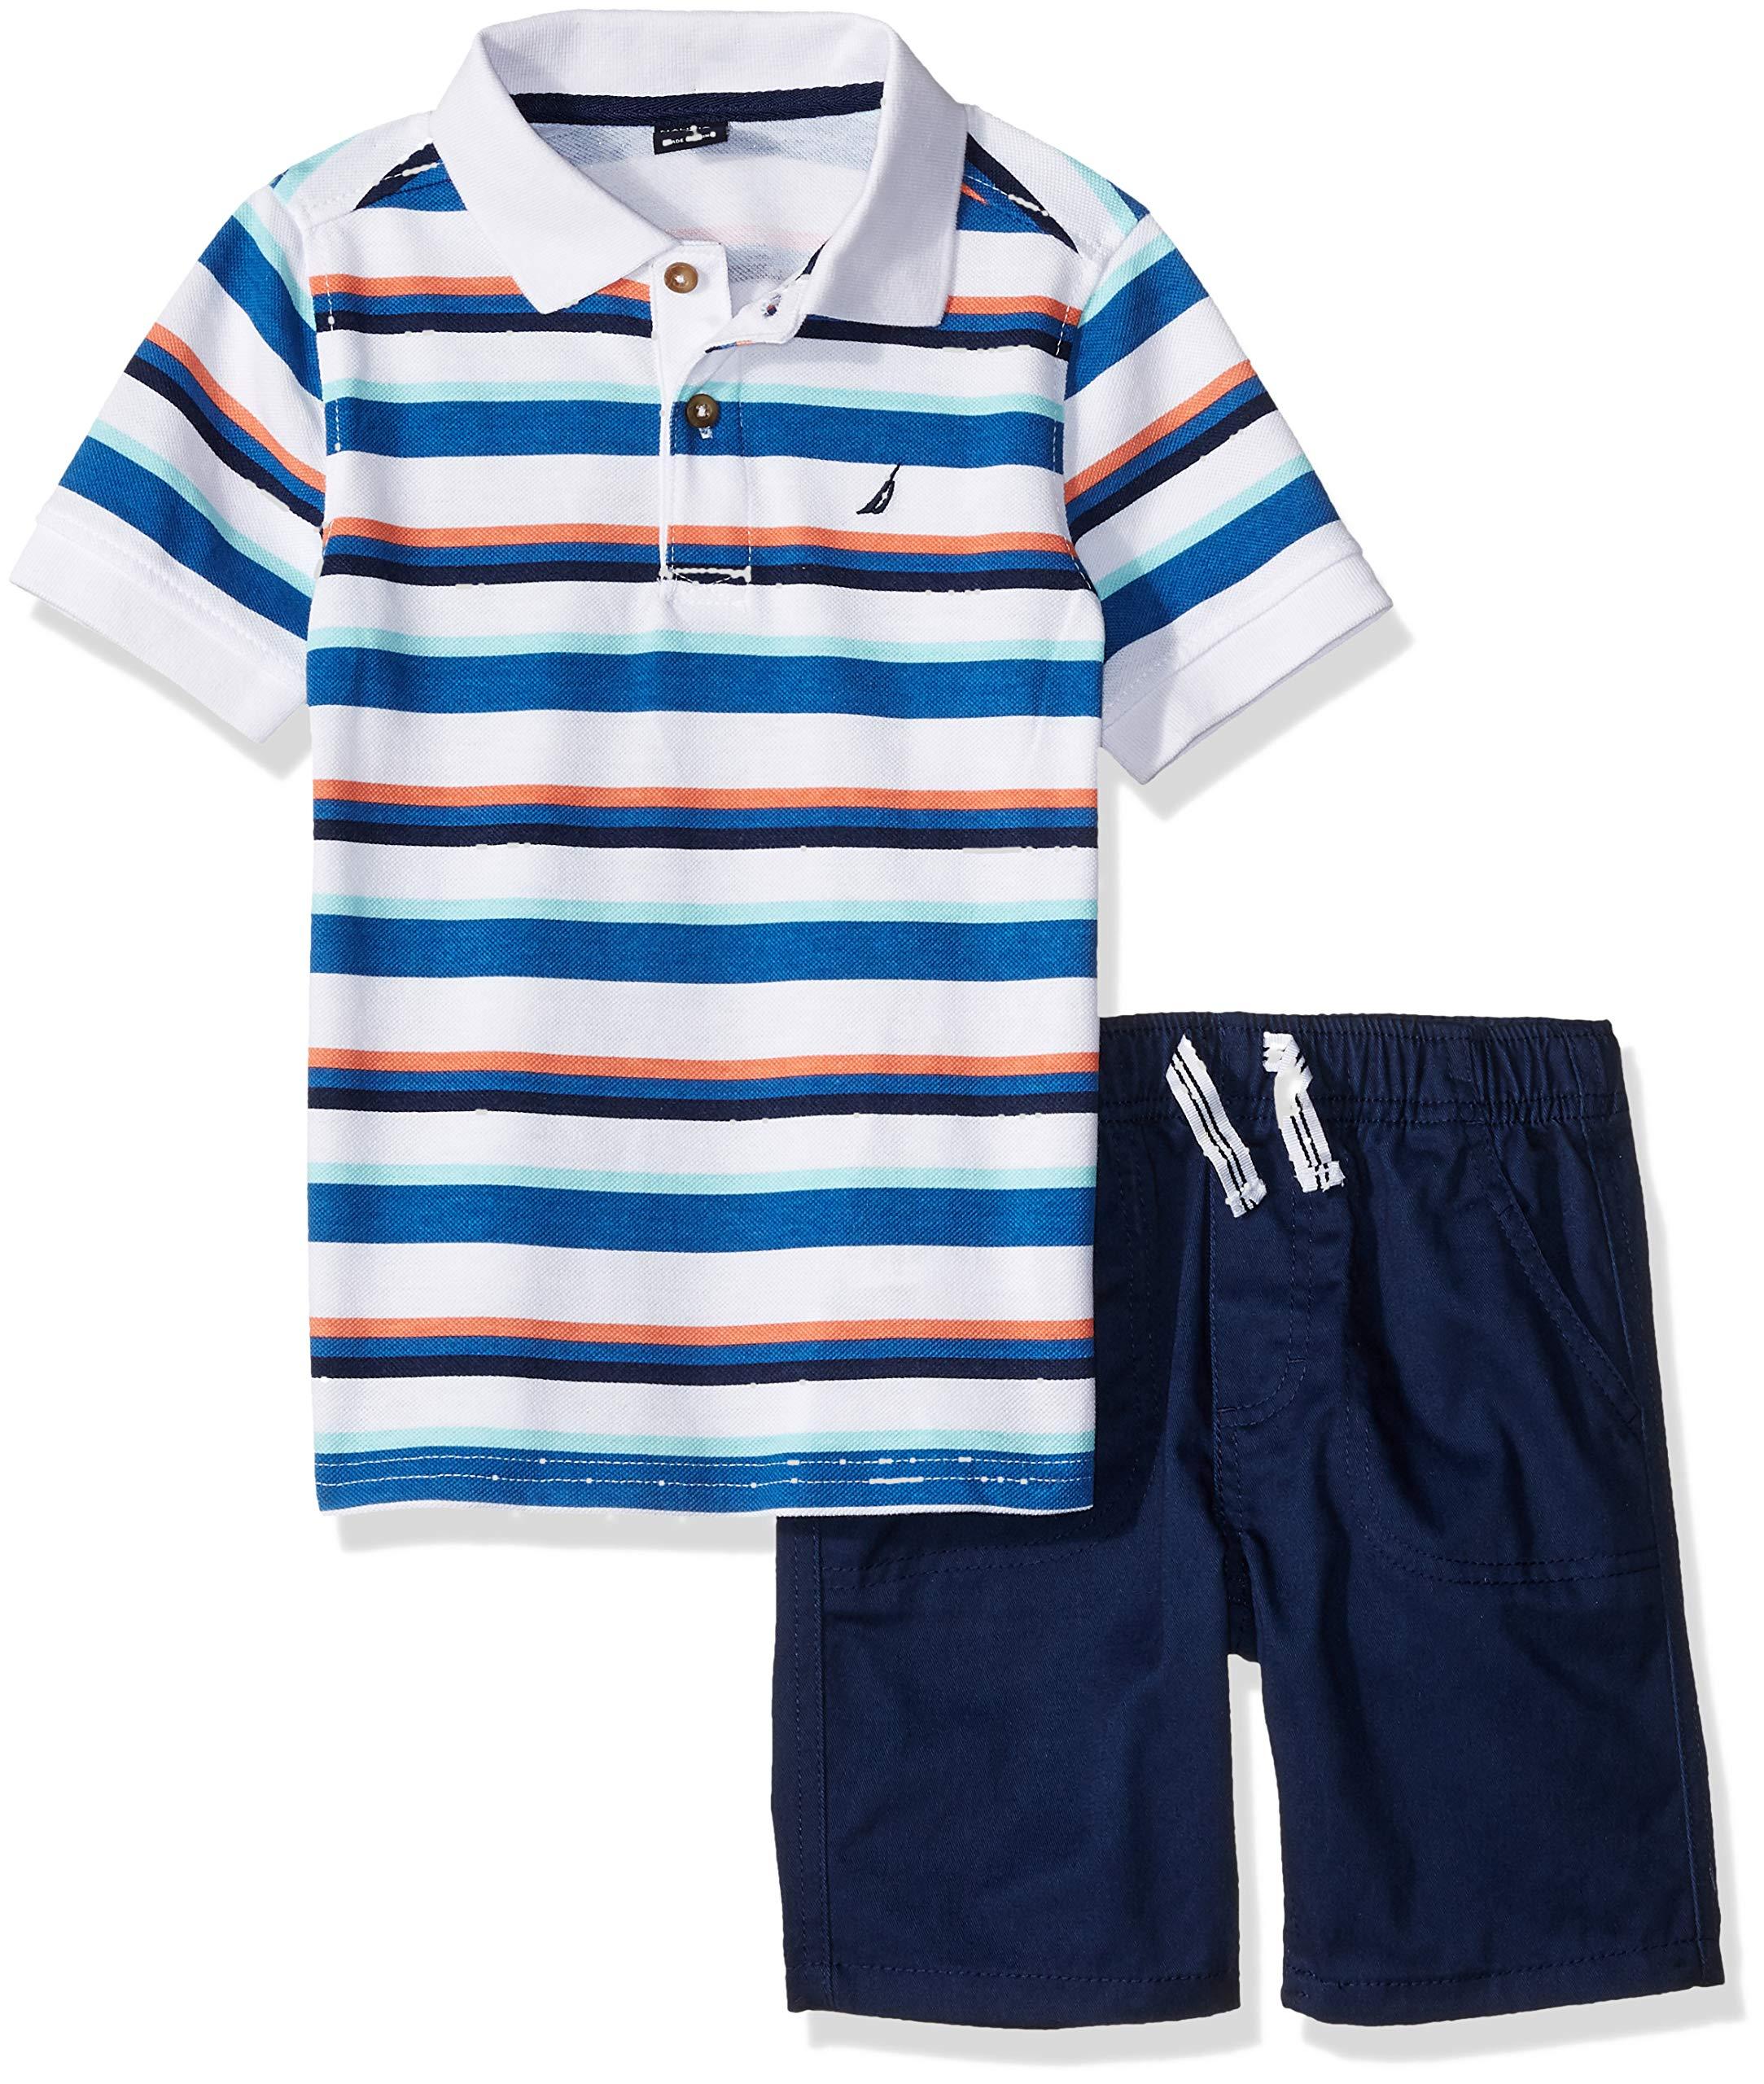 Nautica Sets (KHQ) Boys' Little' 2 Pieces Polo Shorts Set Stripes/Navy 6